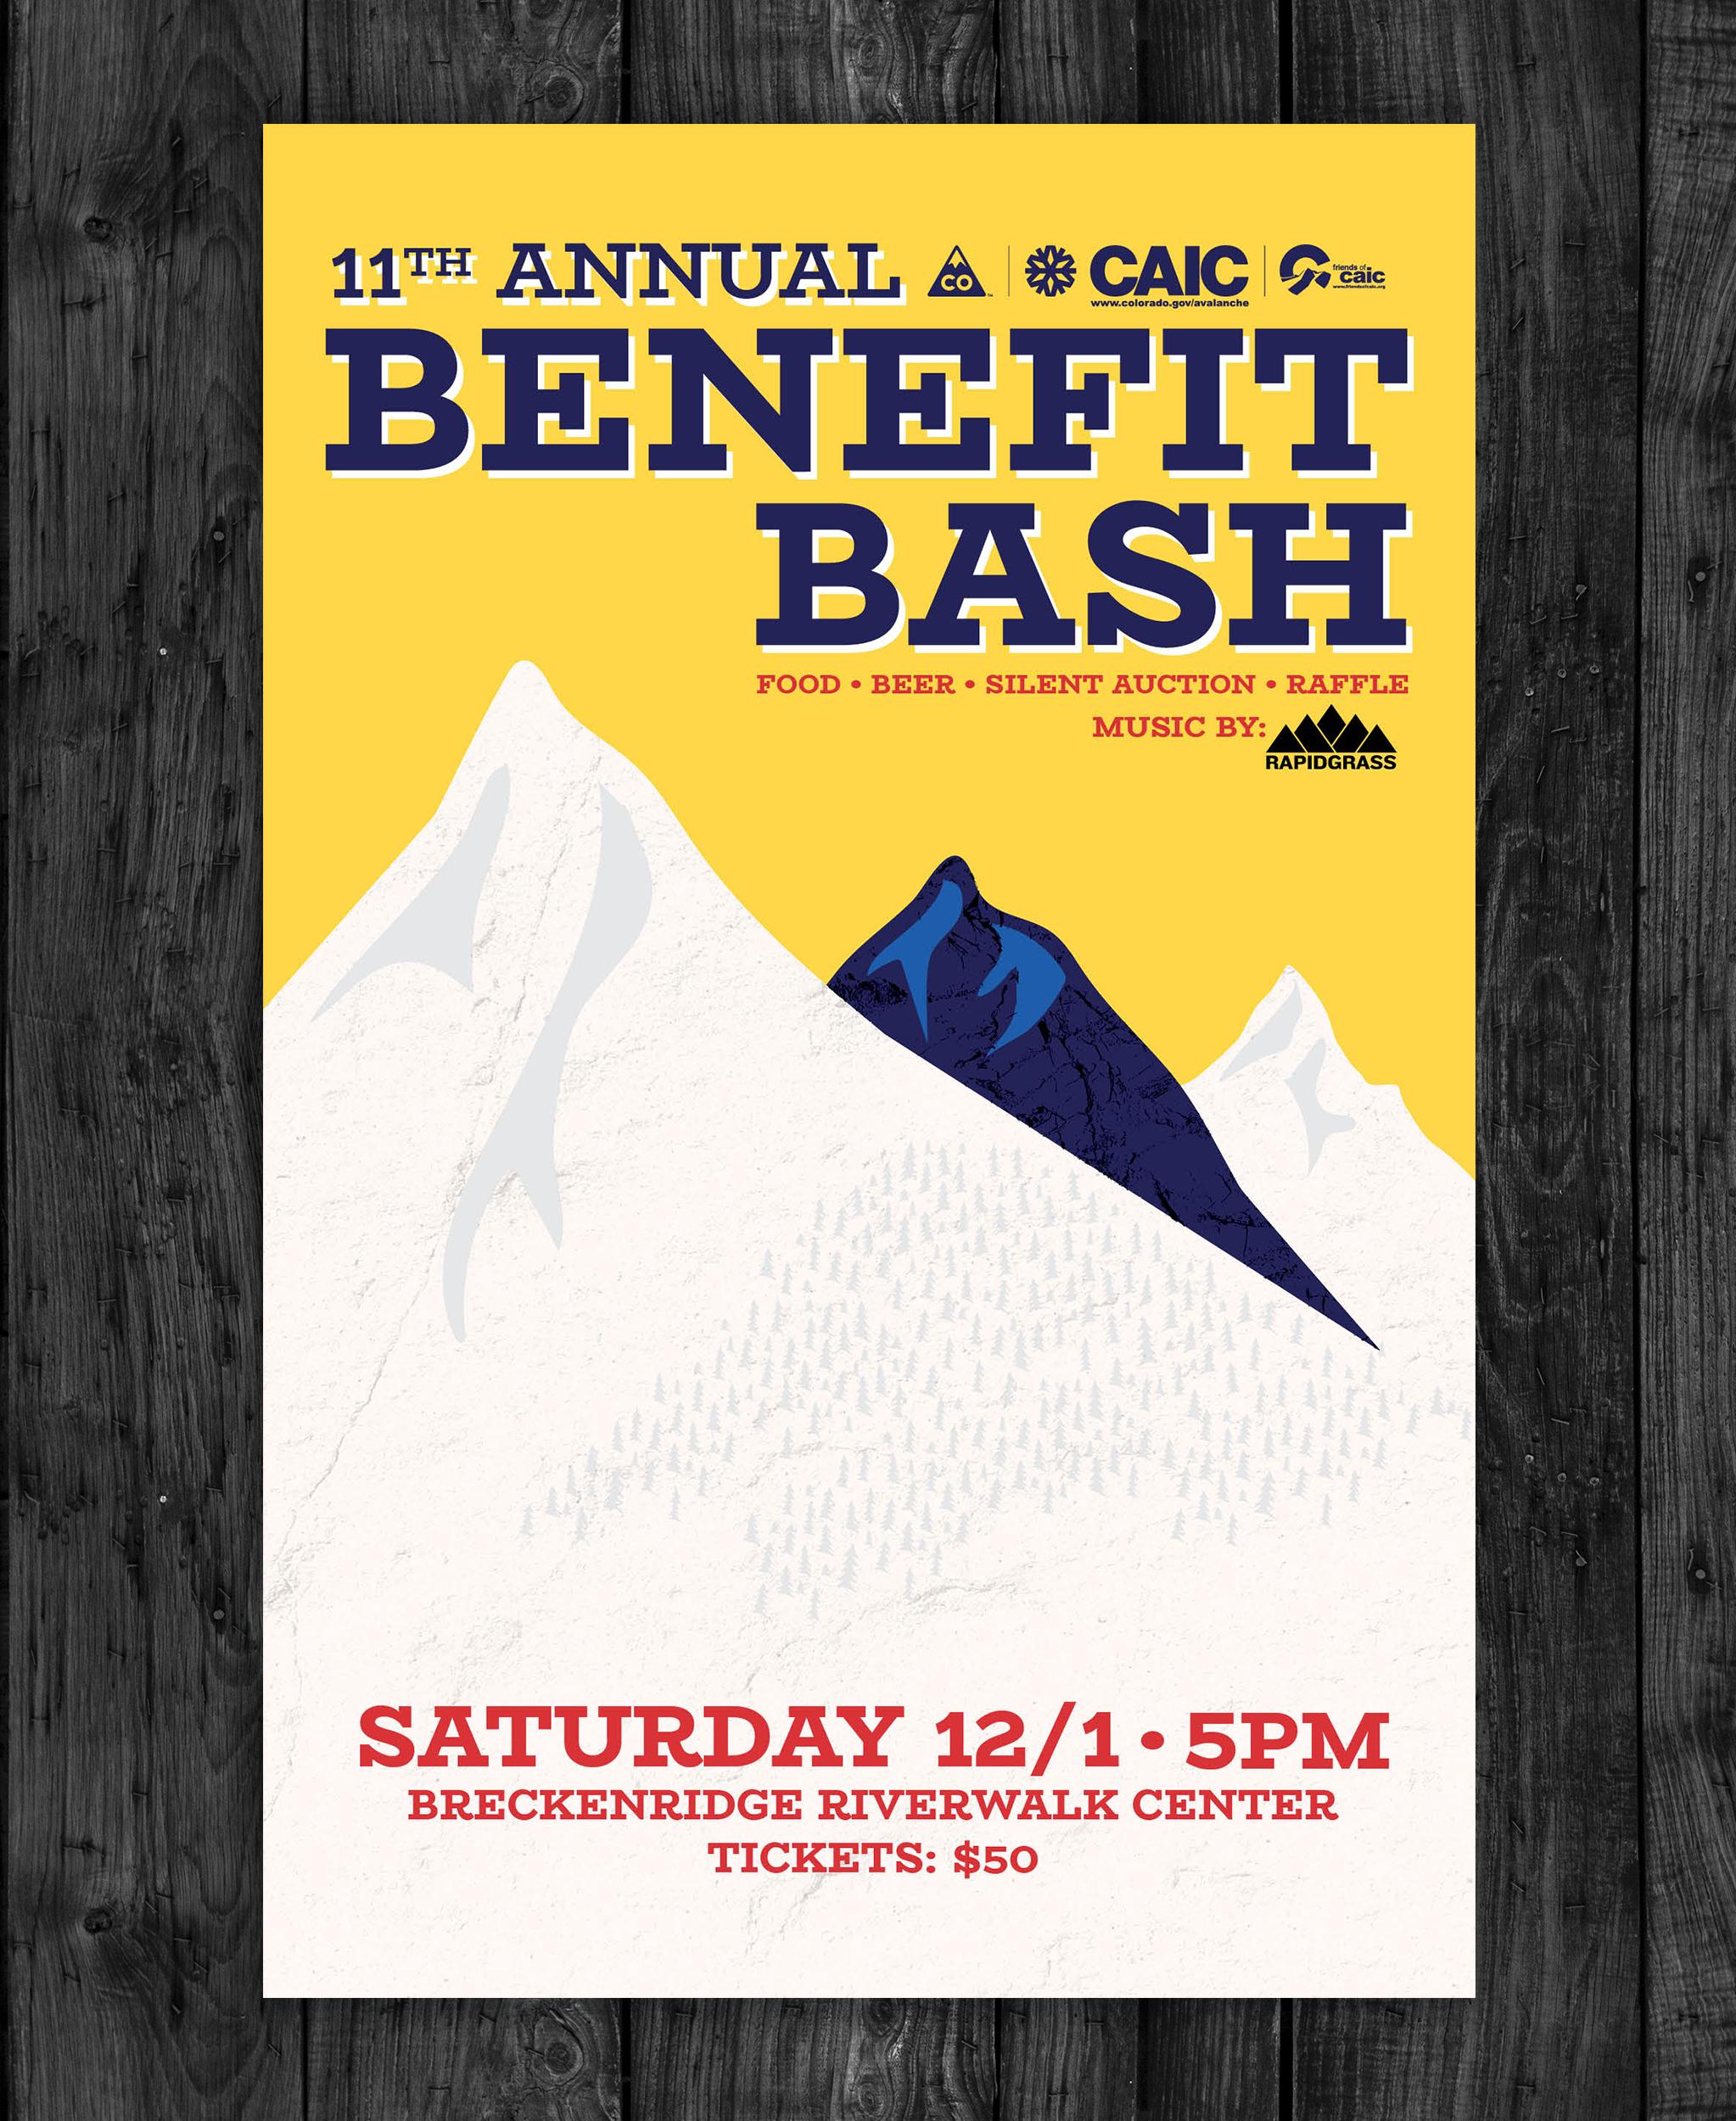 Colorado Avalanche Information Center Benefit Bash.jpg